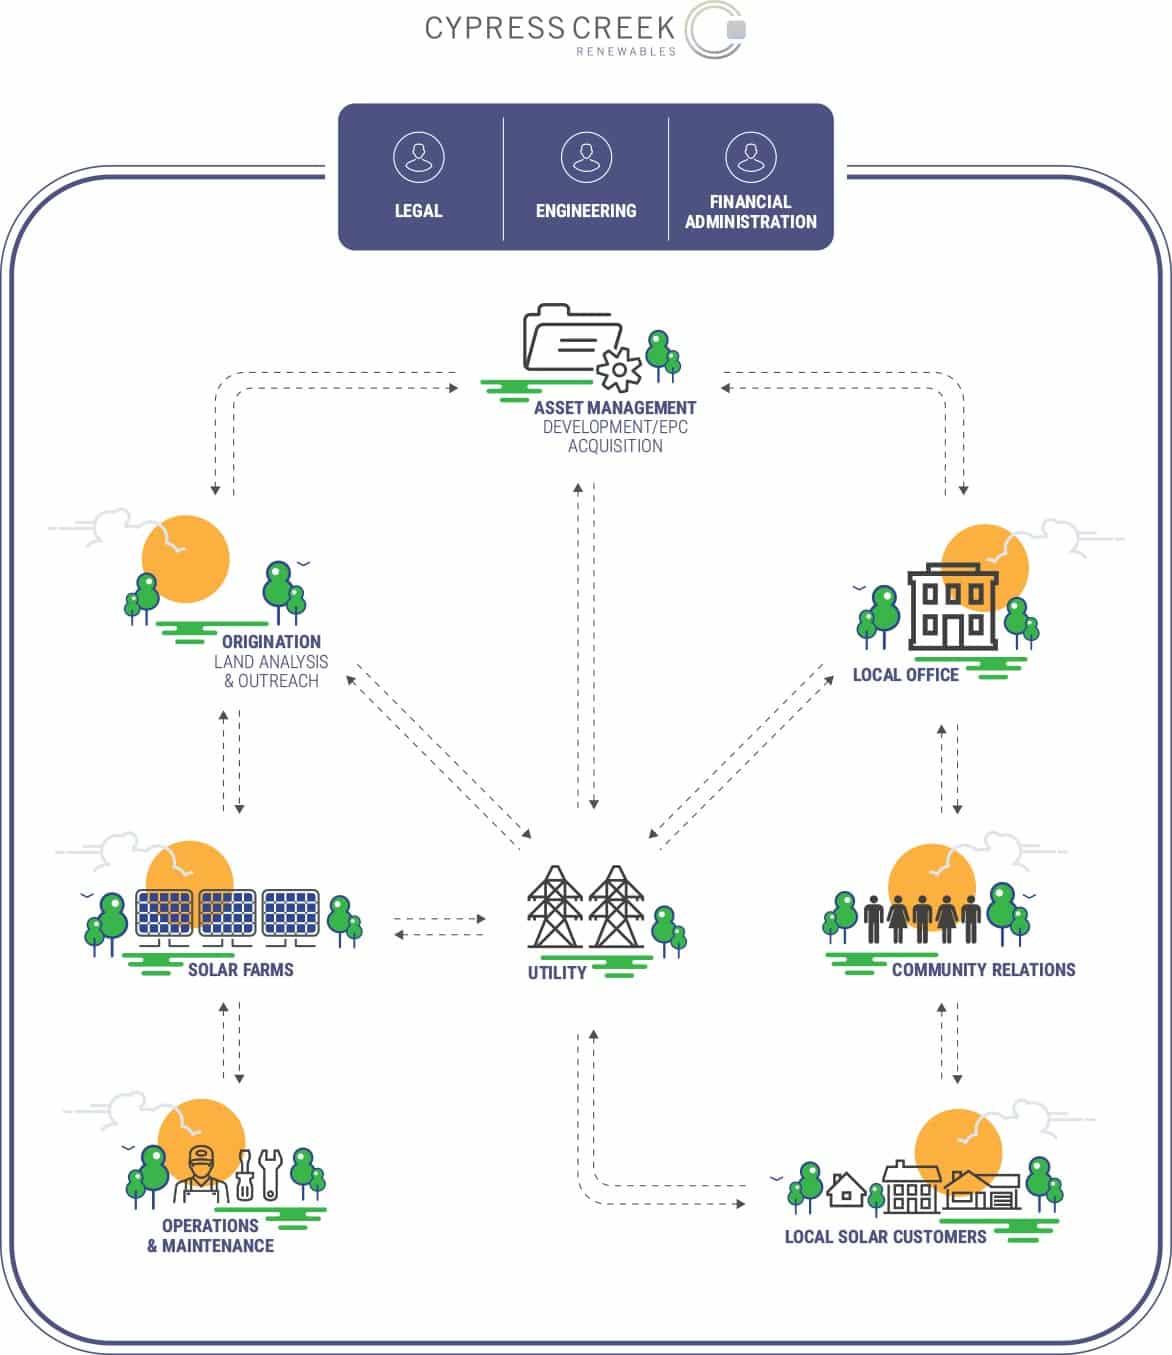 Cypress Creek Renewables Solar Project Development [infographic]